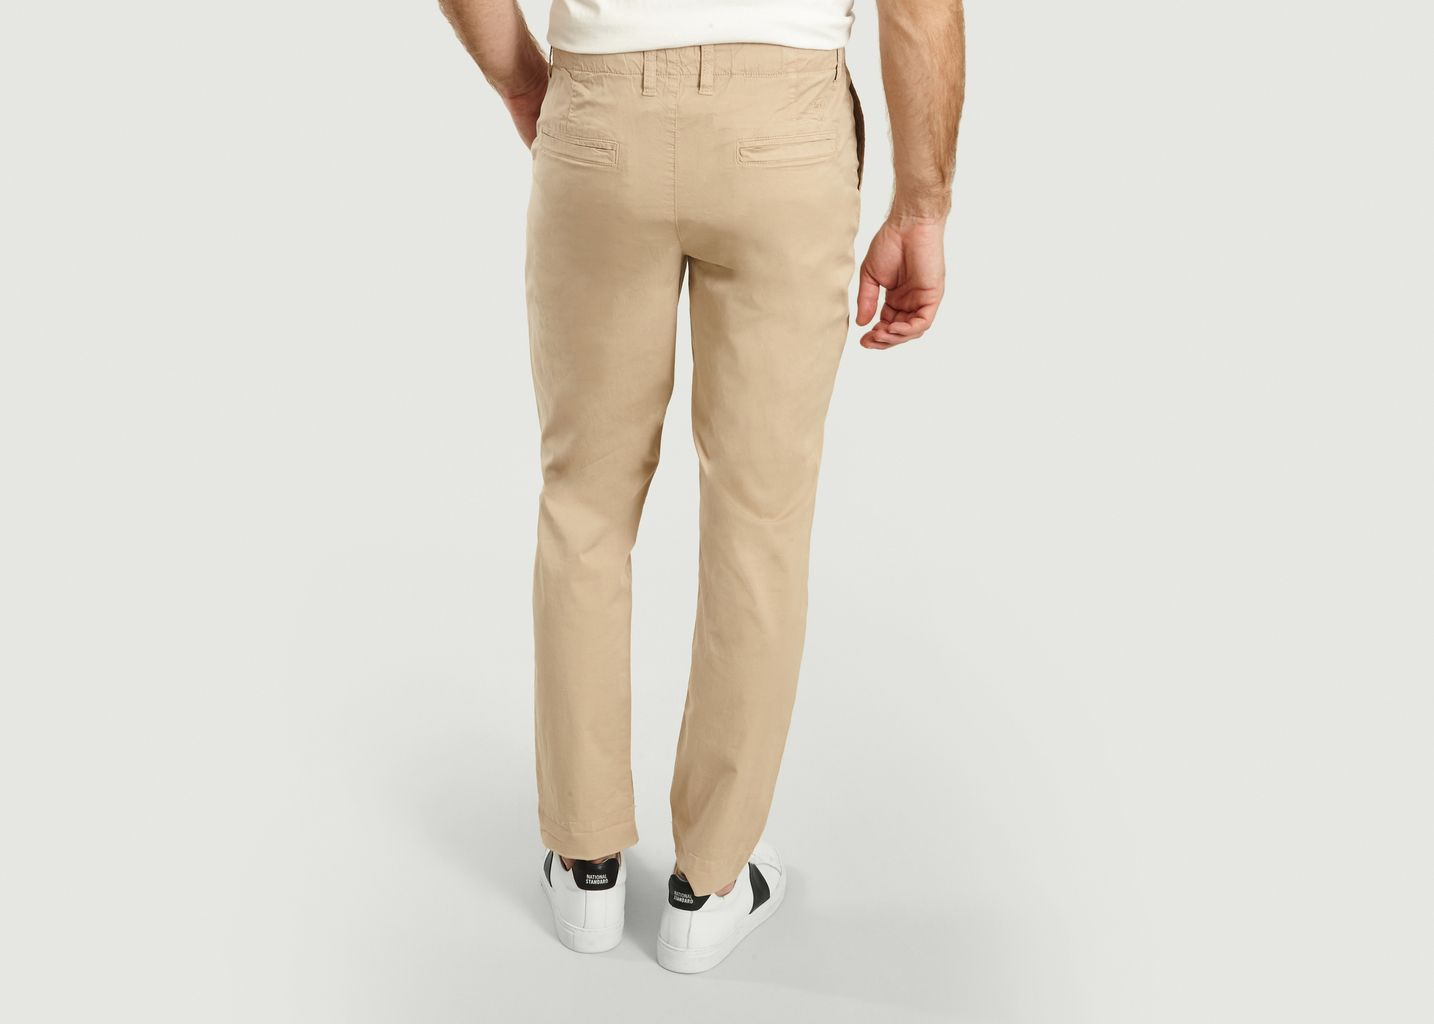 Pantalon Chino Chuck - Knowledge Cotton Apparel